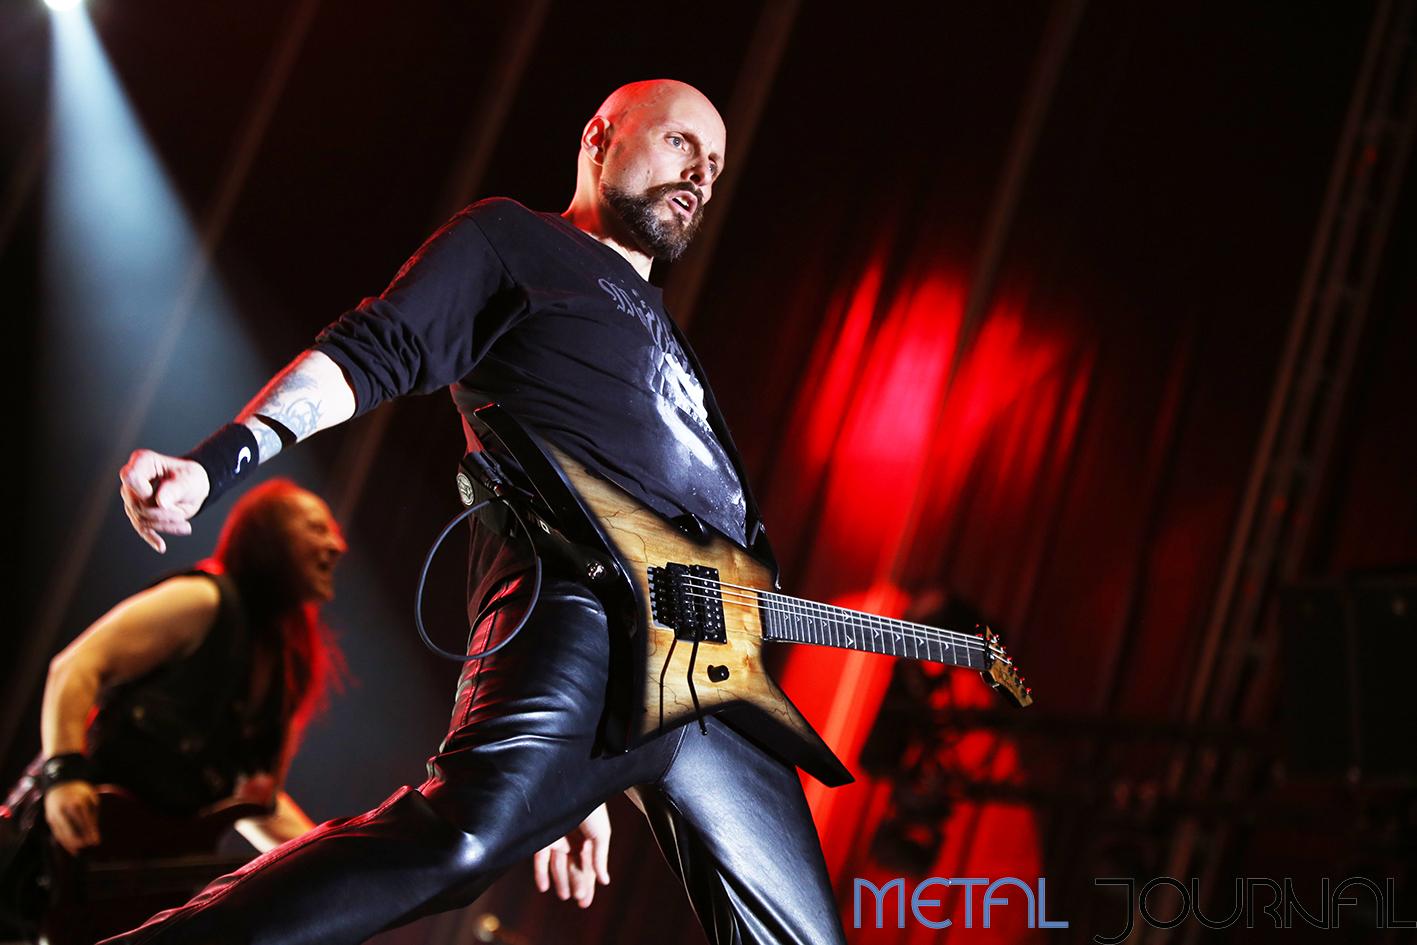 venom - metal journal rock fest barcelona 2019 pic 3